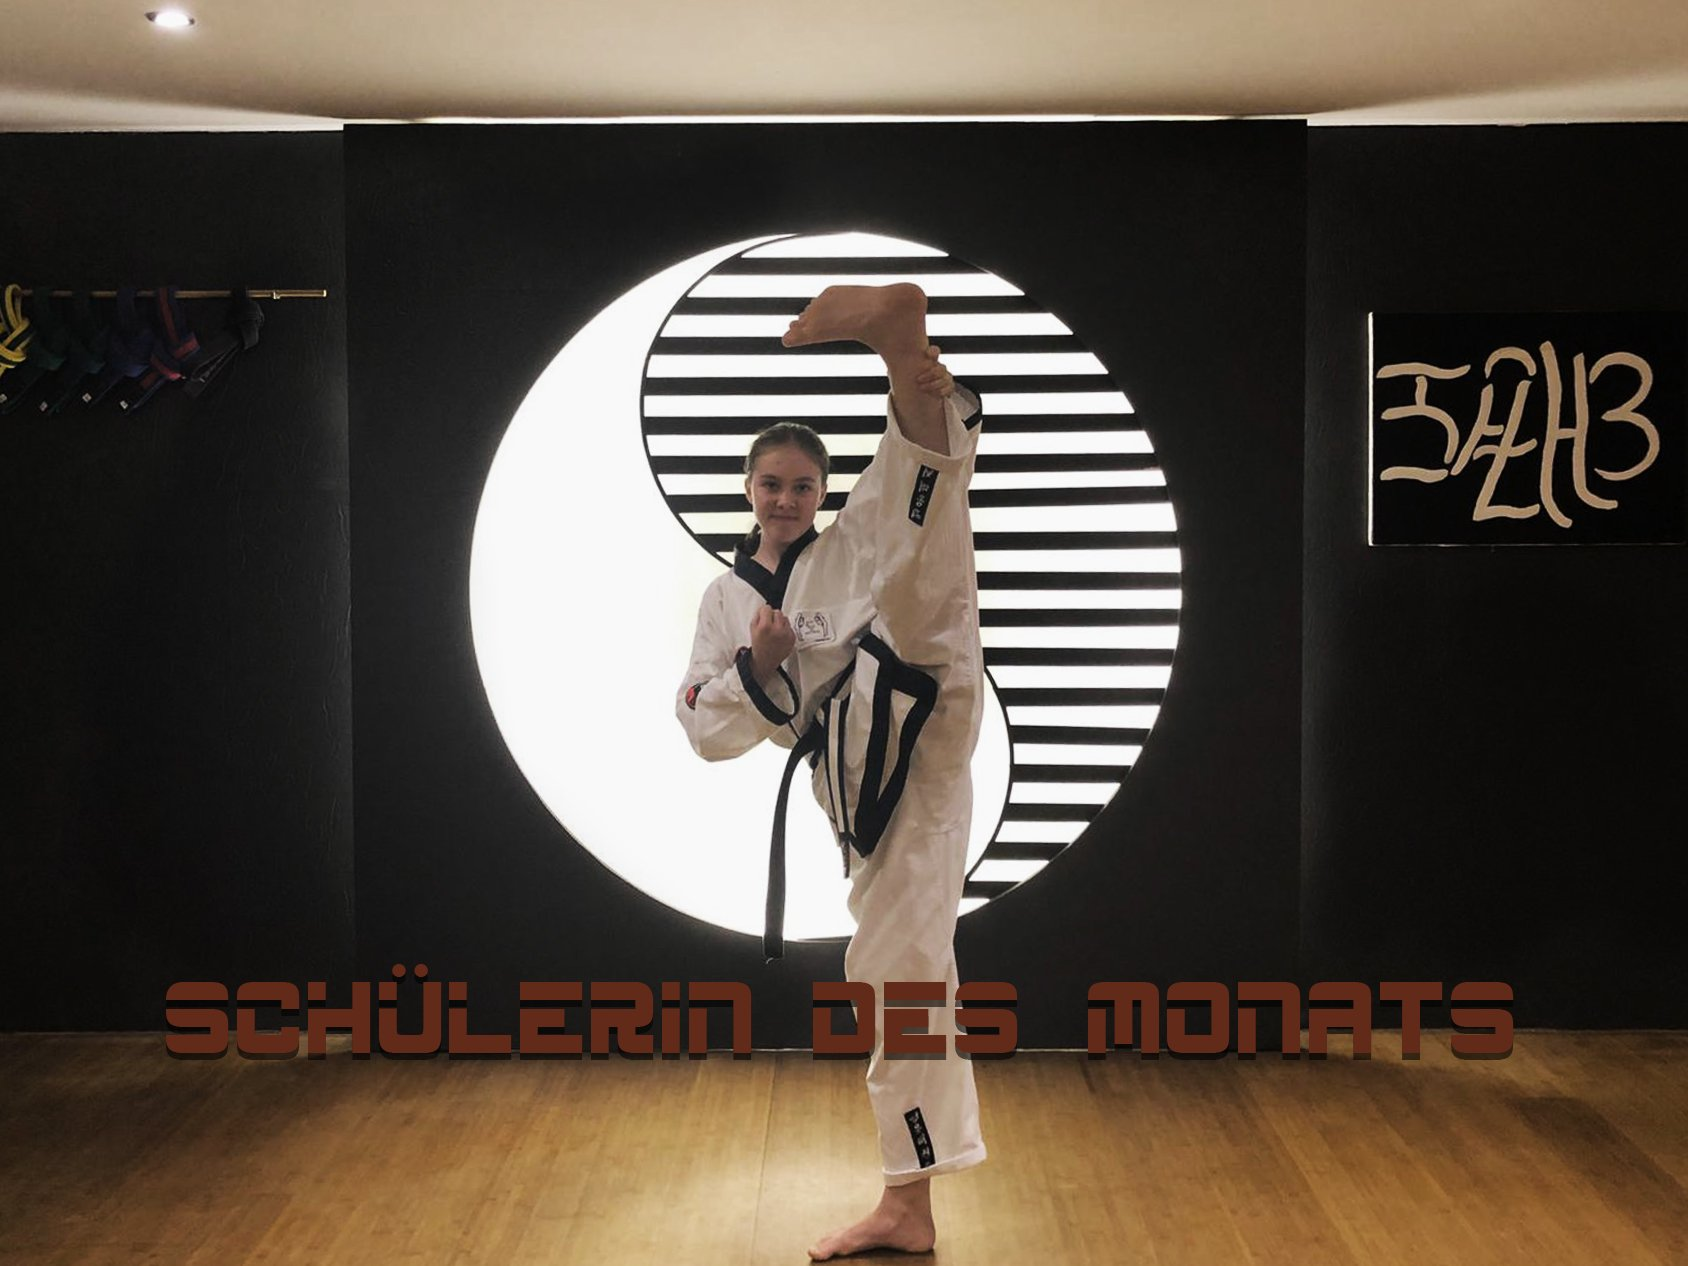 YOUNG-UNG Taekwondo Schülerin des Monats Andjela Andric